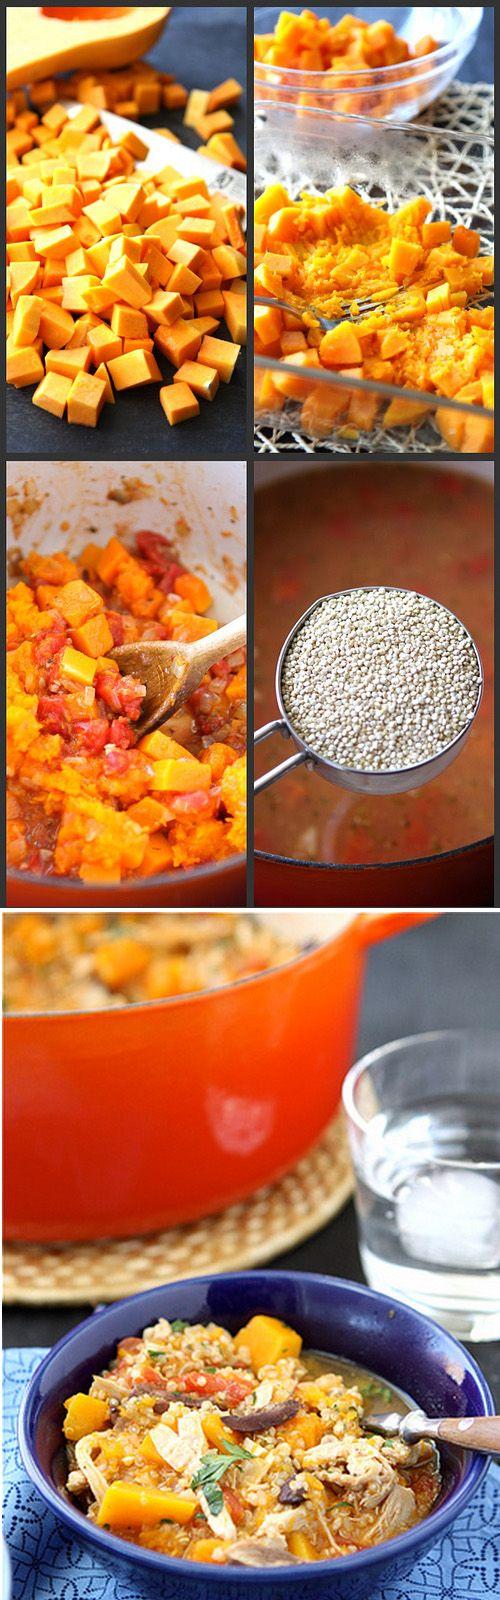 Hearty Chicken Stew with Butternut Squash & Quinoa Recipe | Homemade ...